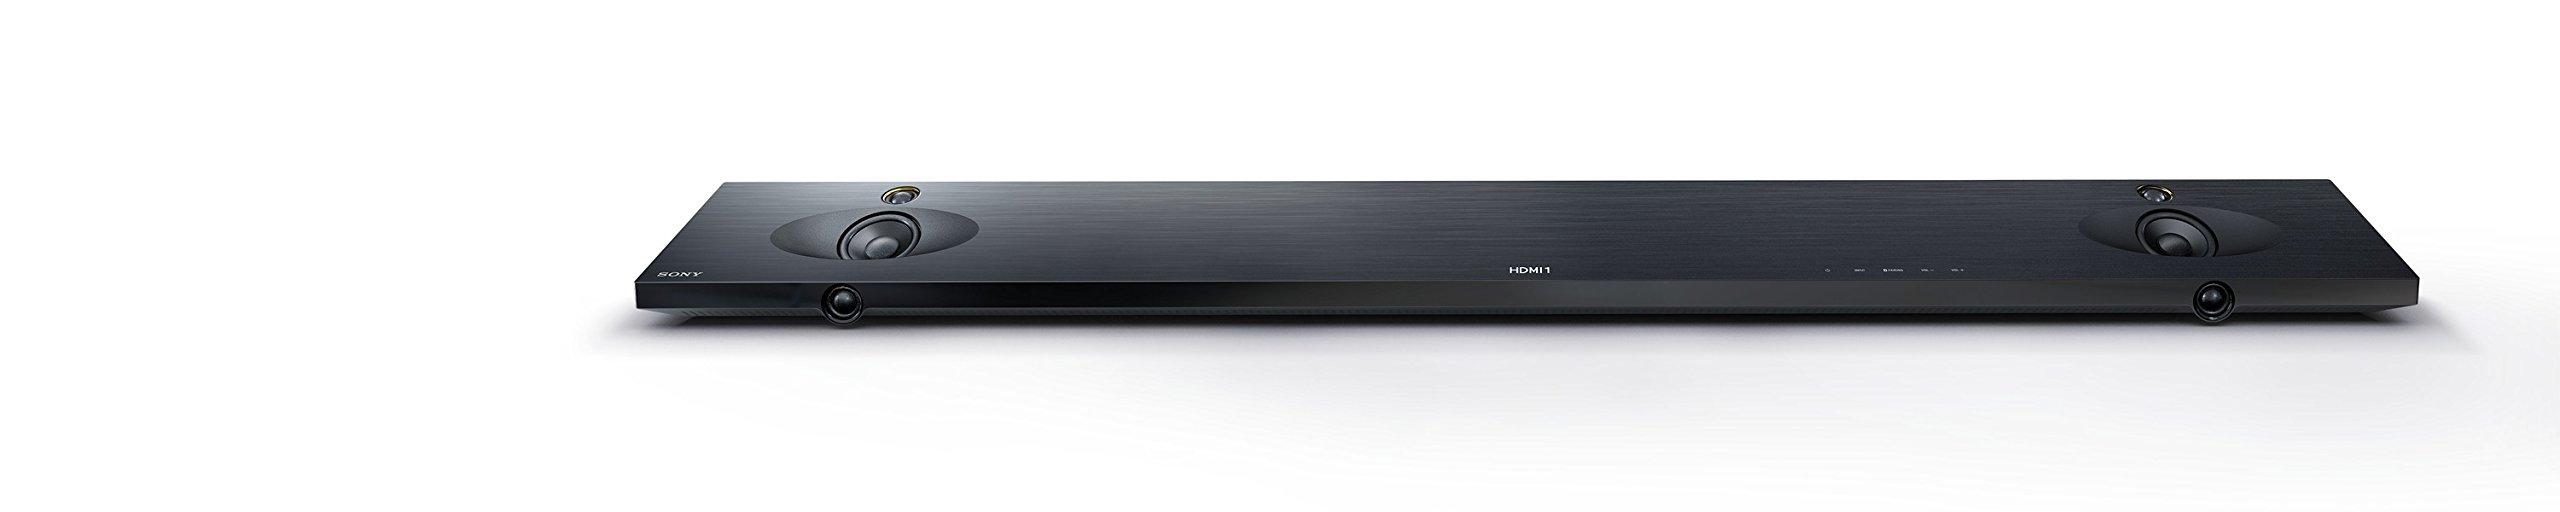 Sony HT-NT5 Sound Bar w/Hi-Res Audio and Bluetooth Wireless Streaming HDMI USB (Renewed)